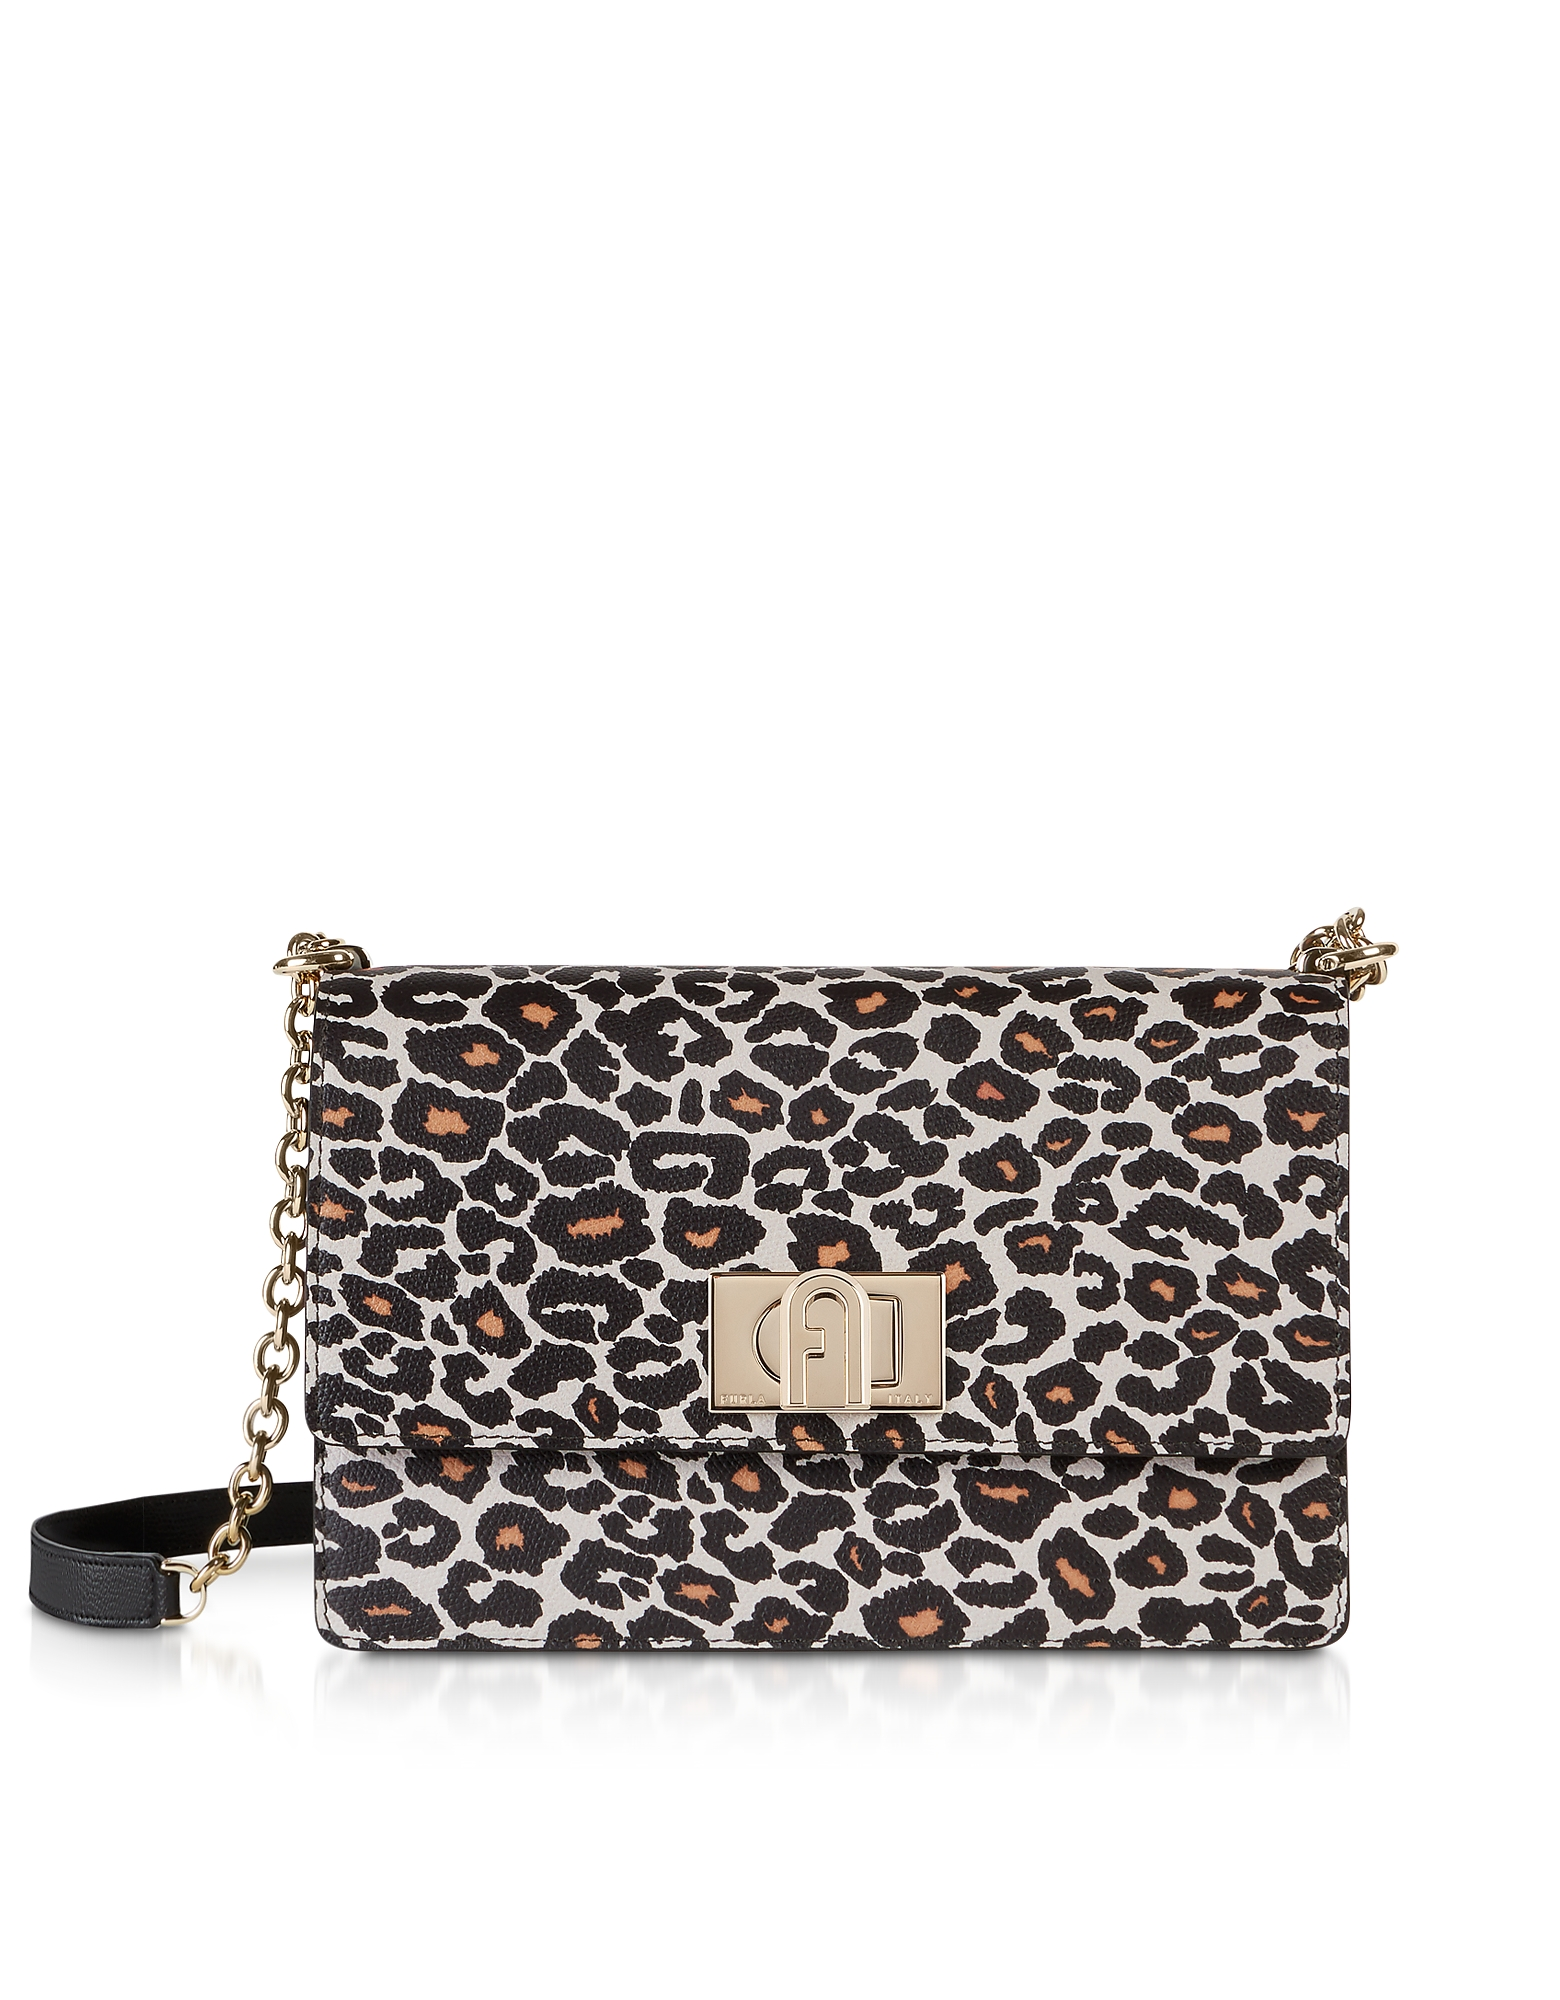 Furla Designer Handbags, Animal Printed Leather 1927 S Crossbody Bag 24